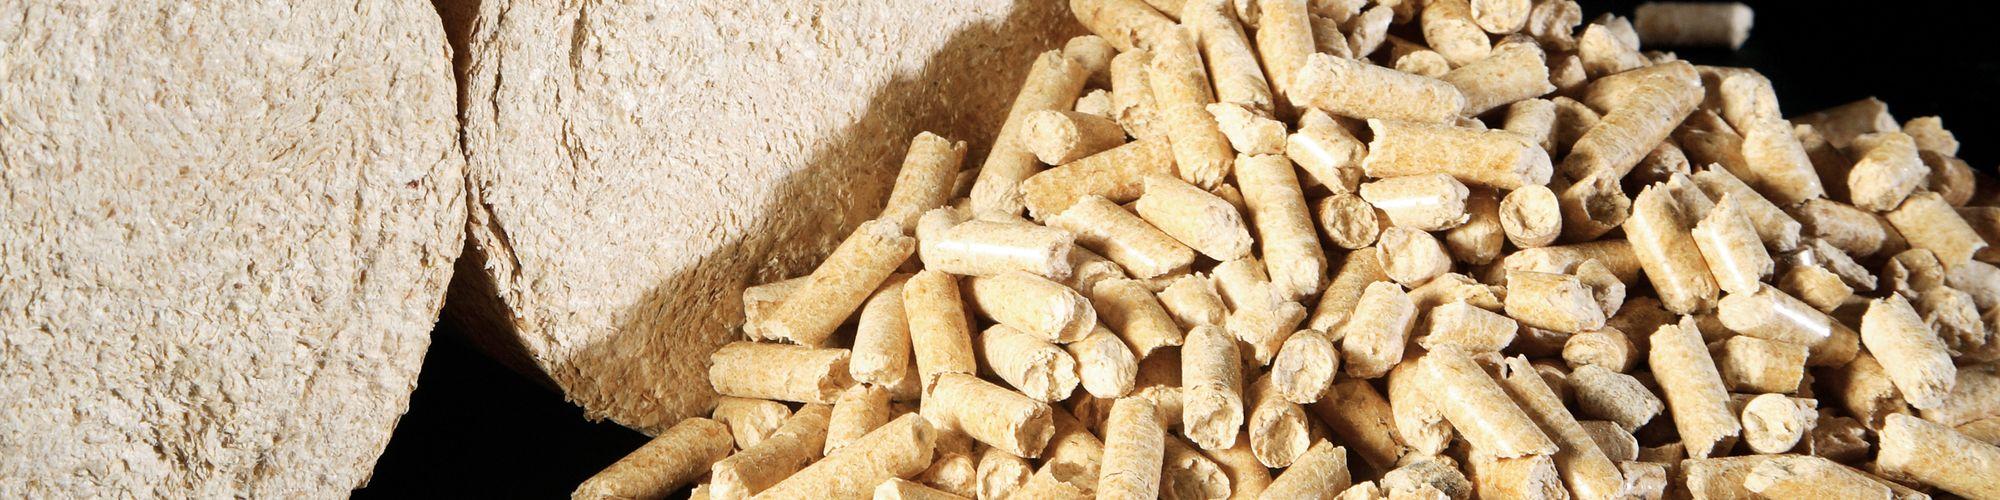 binderholz briketts und pellets